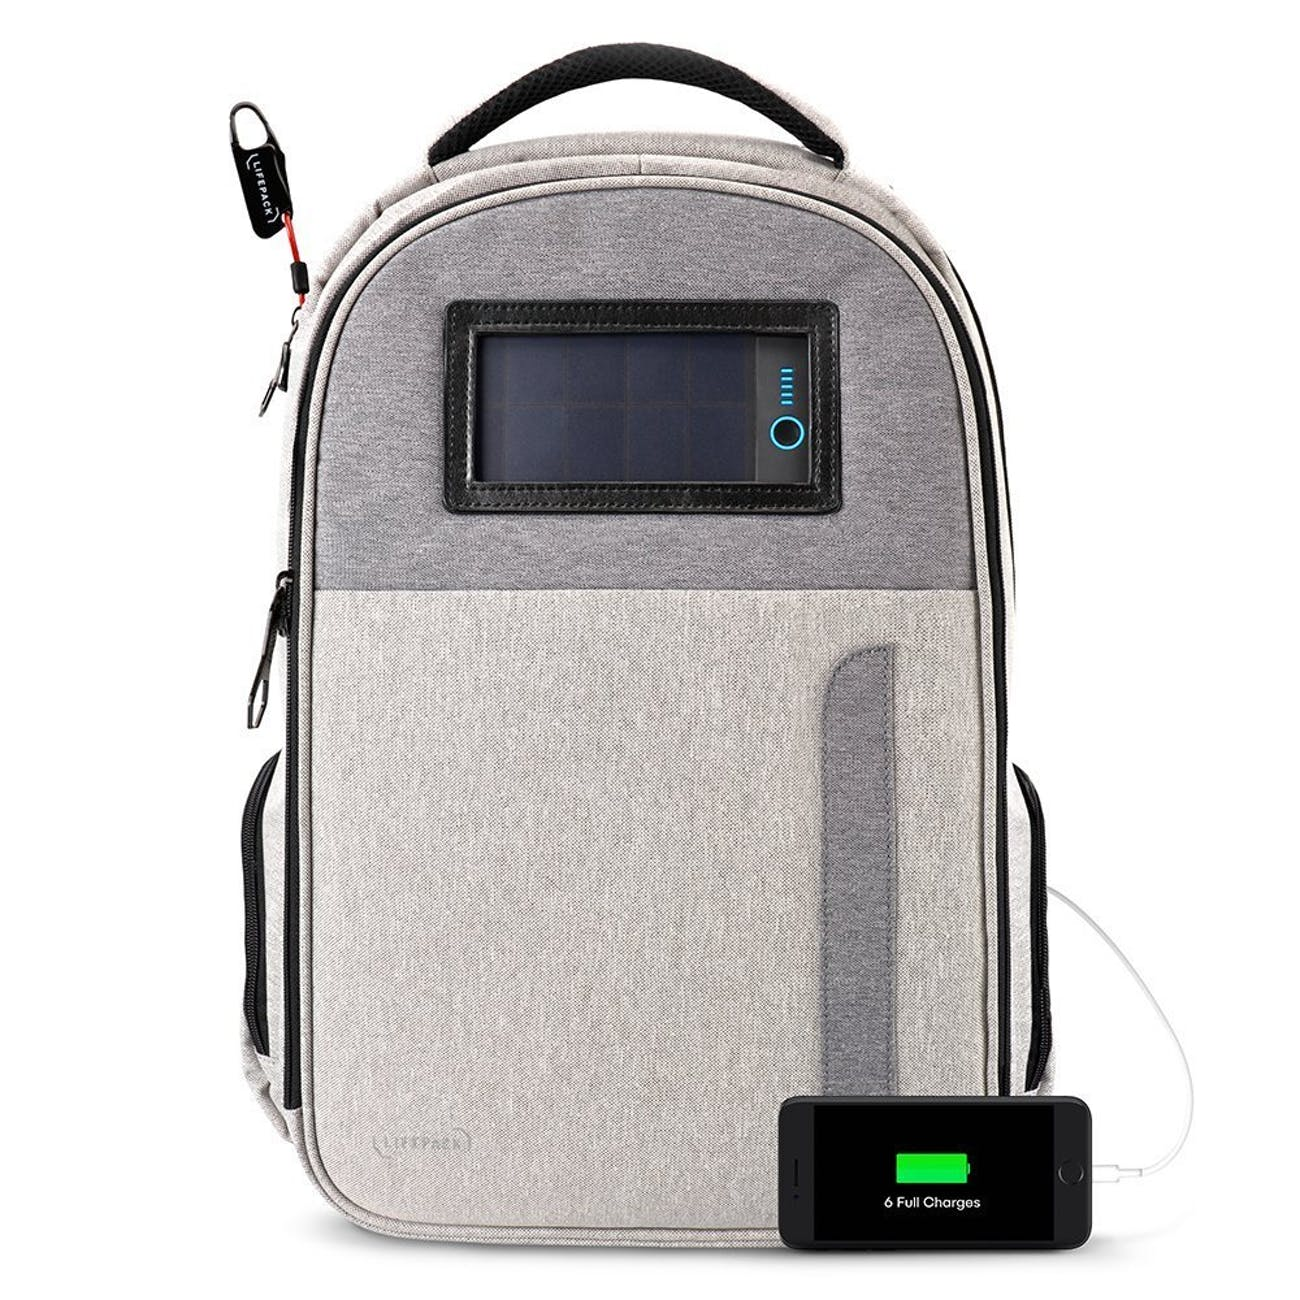 Lifepack Solar-Powered Backpack